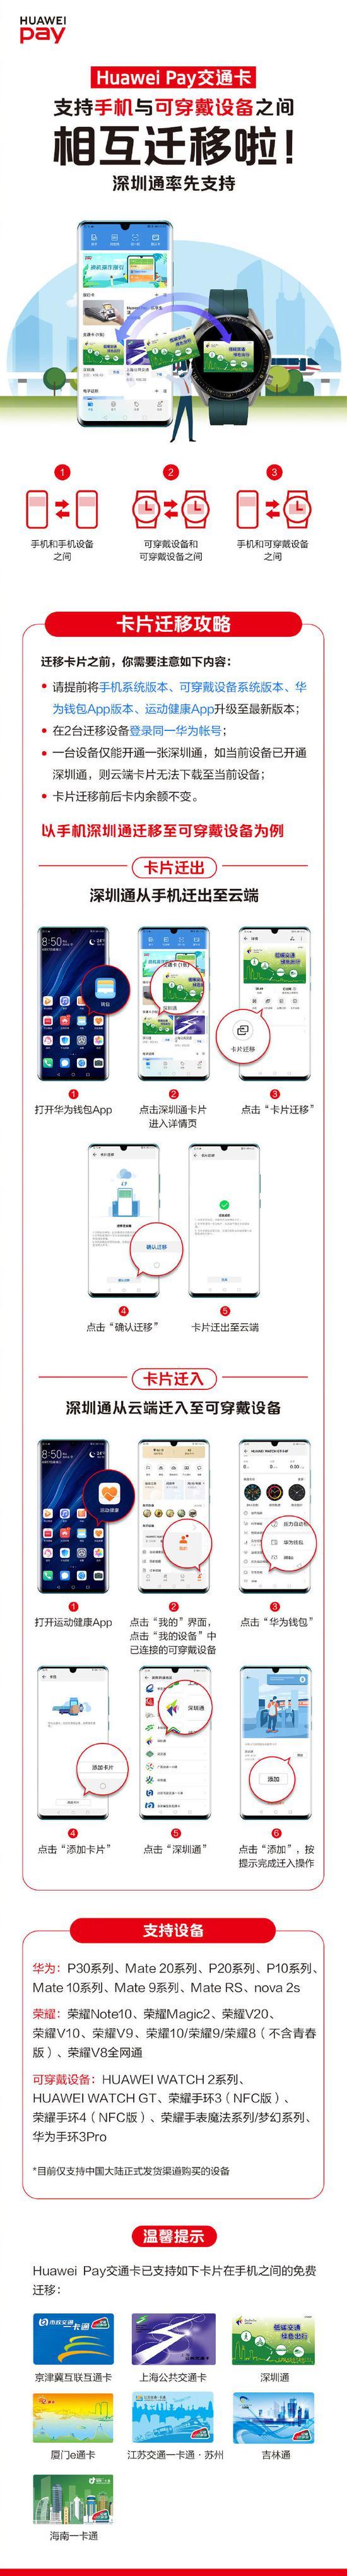 Huawei Pay交通卡迁移